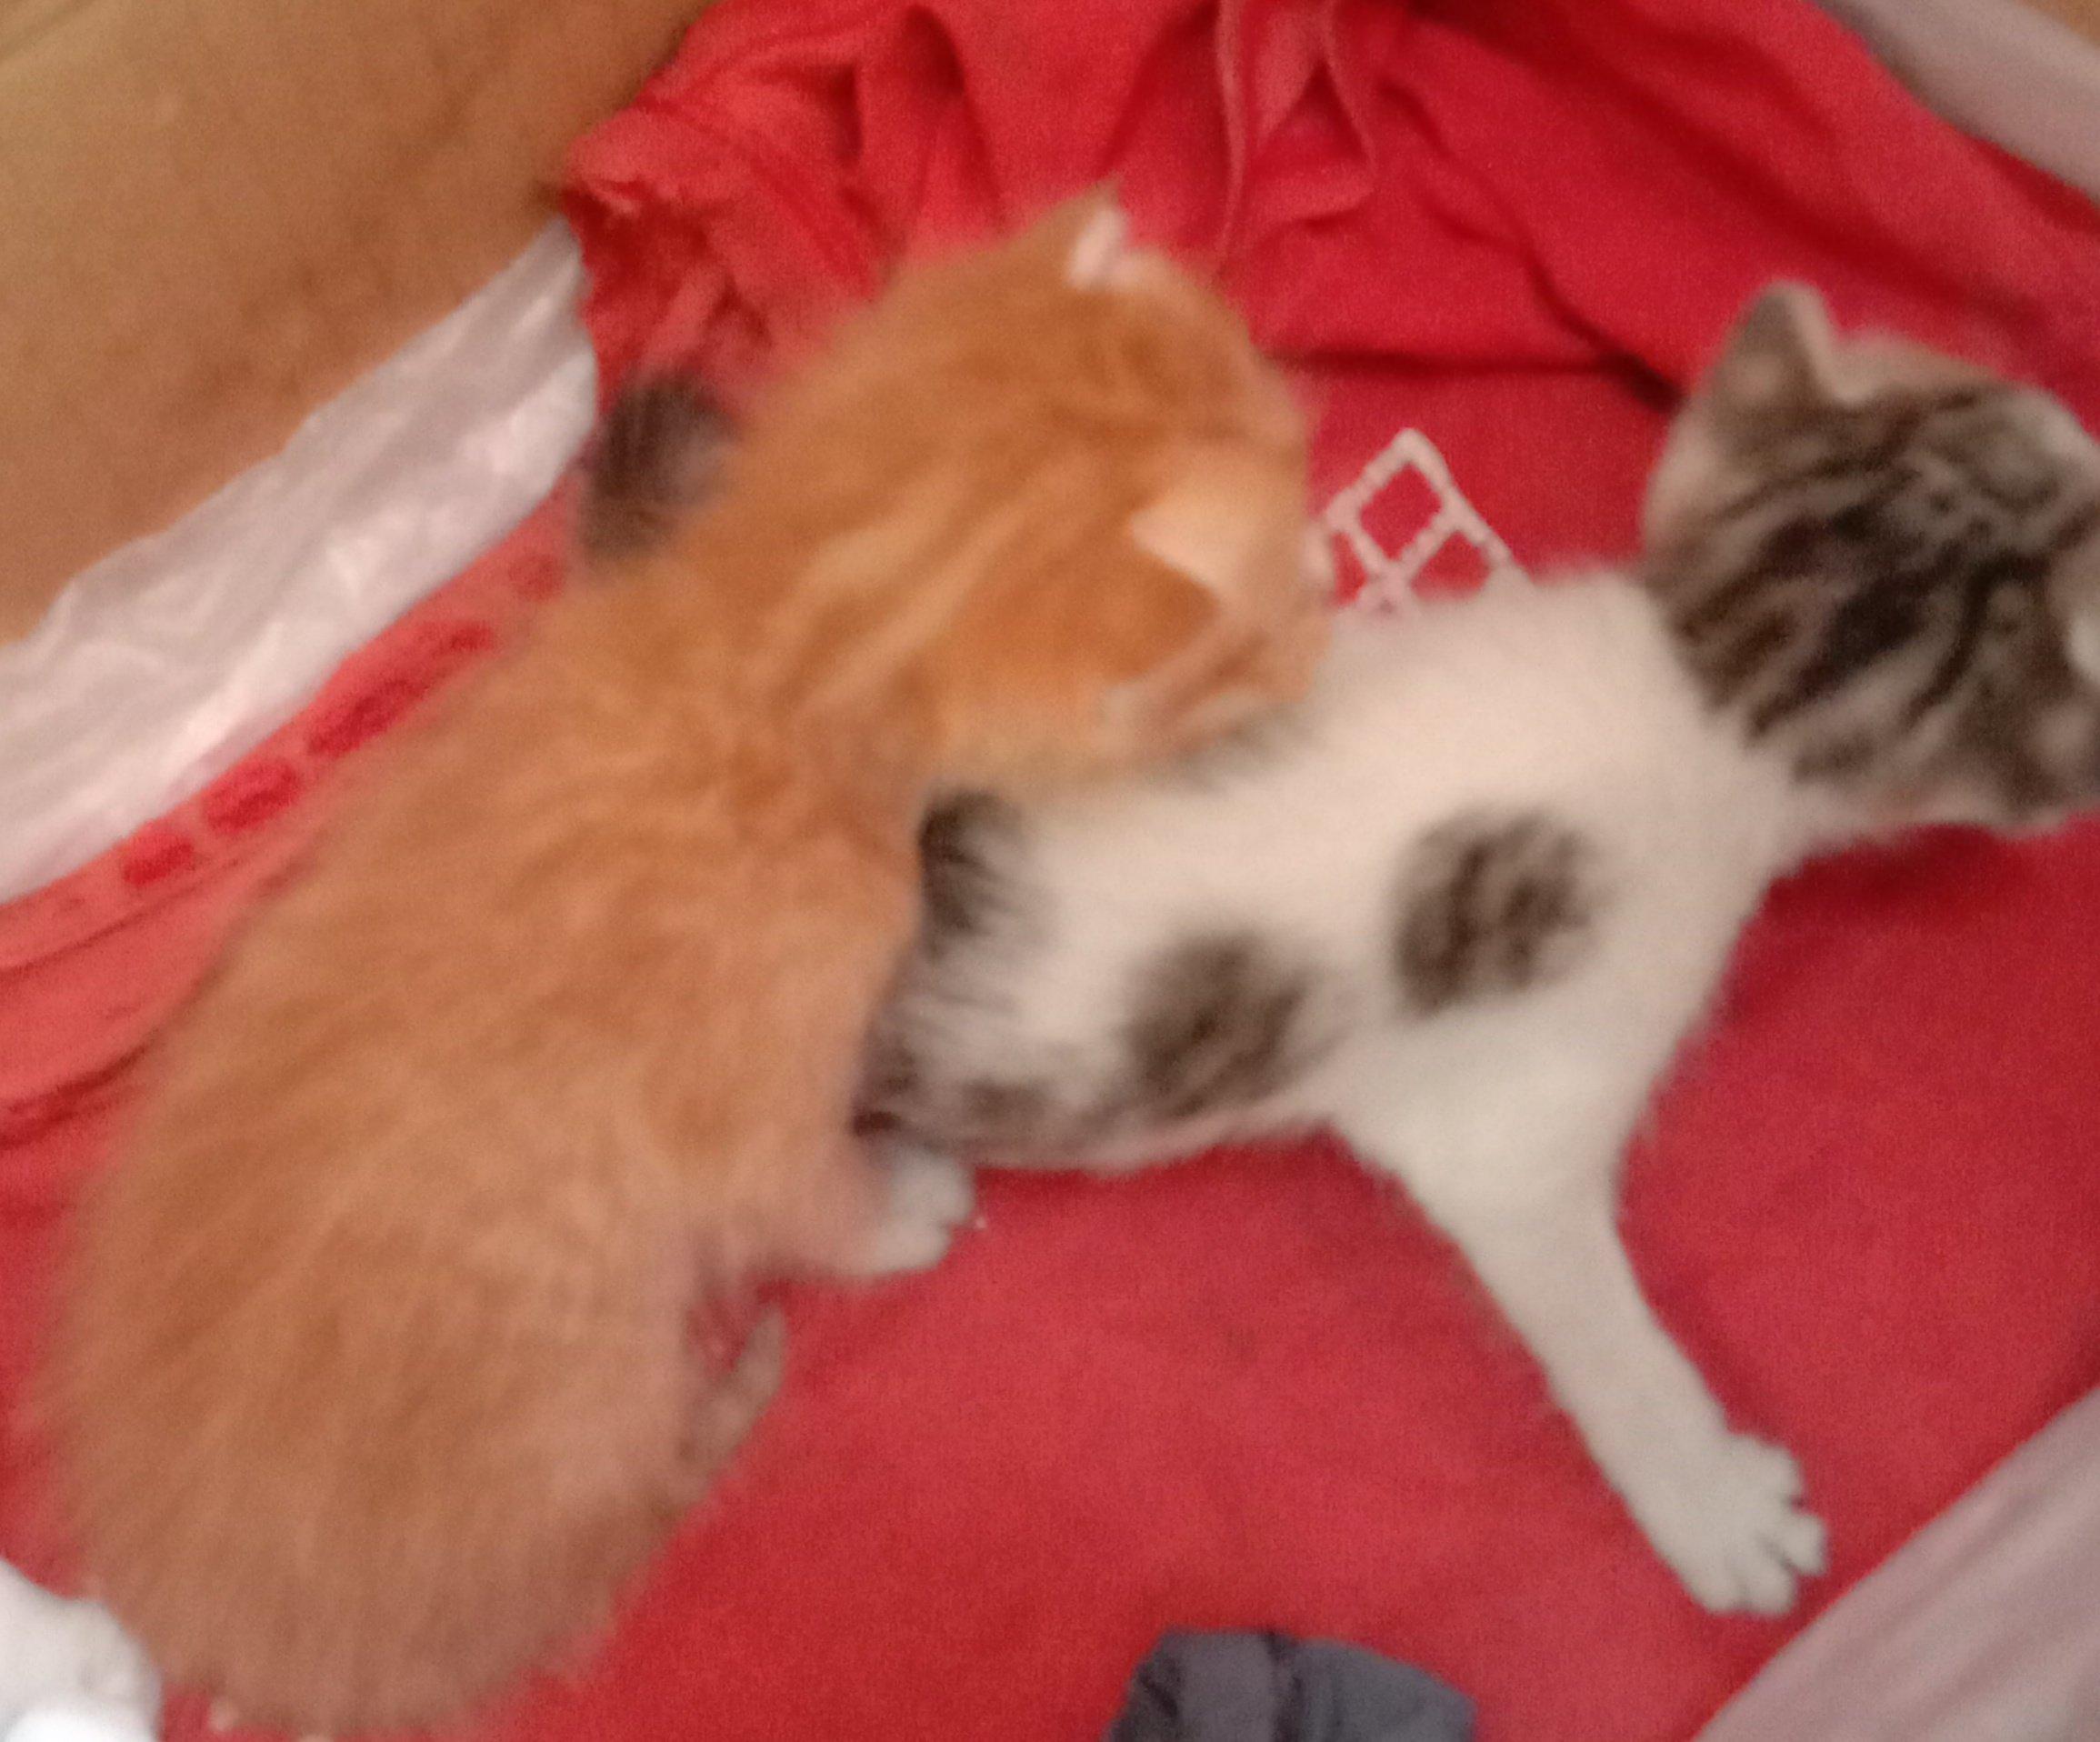 Two baby kitten